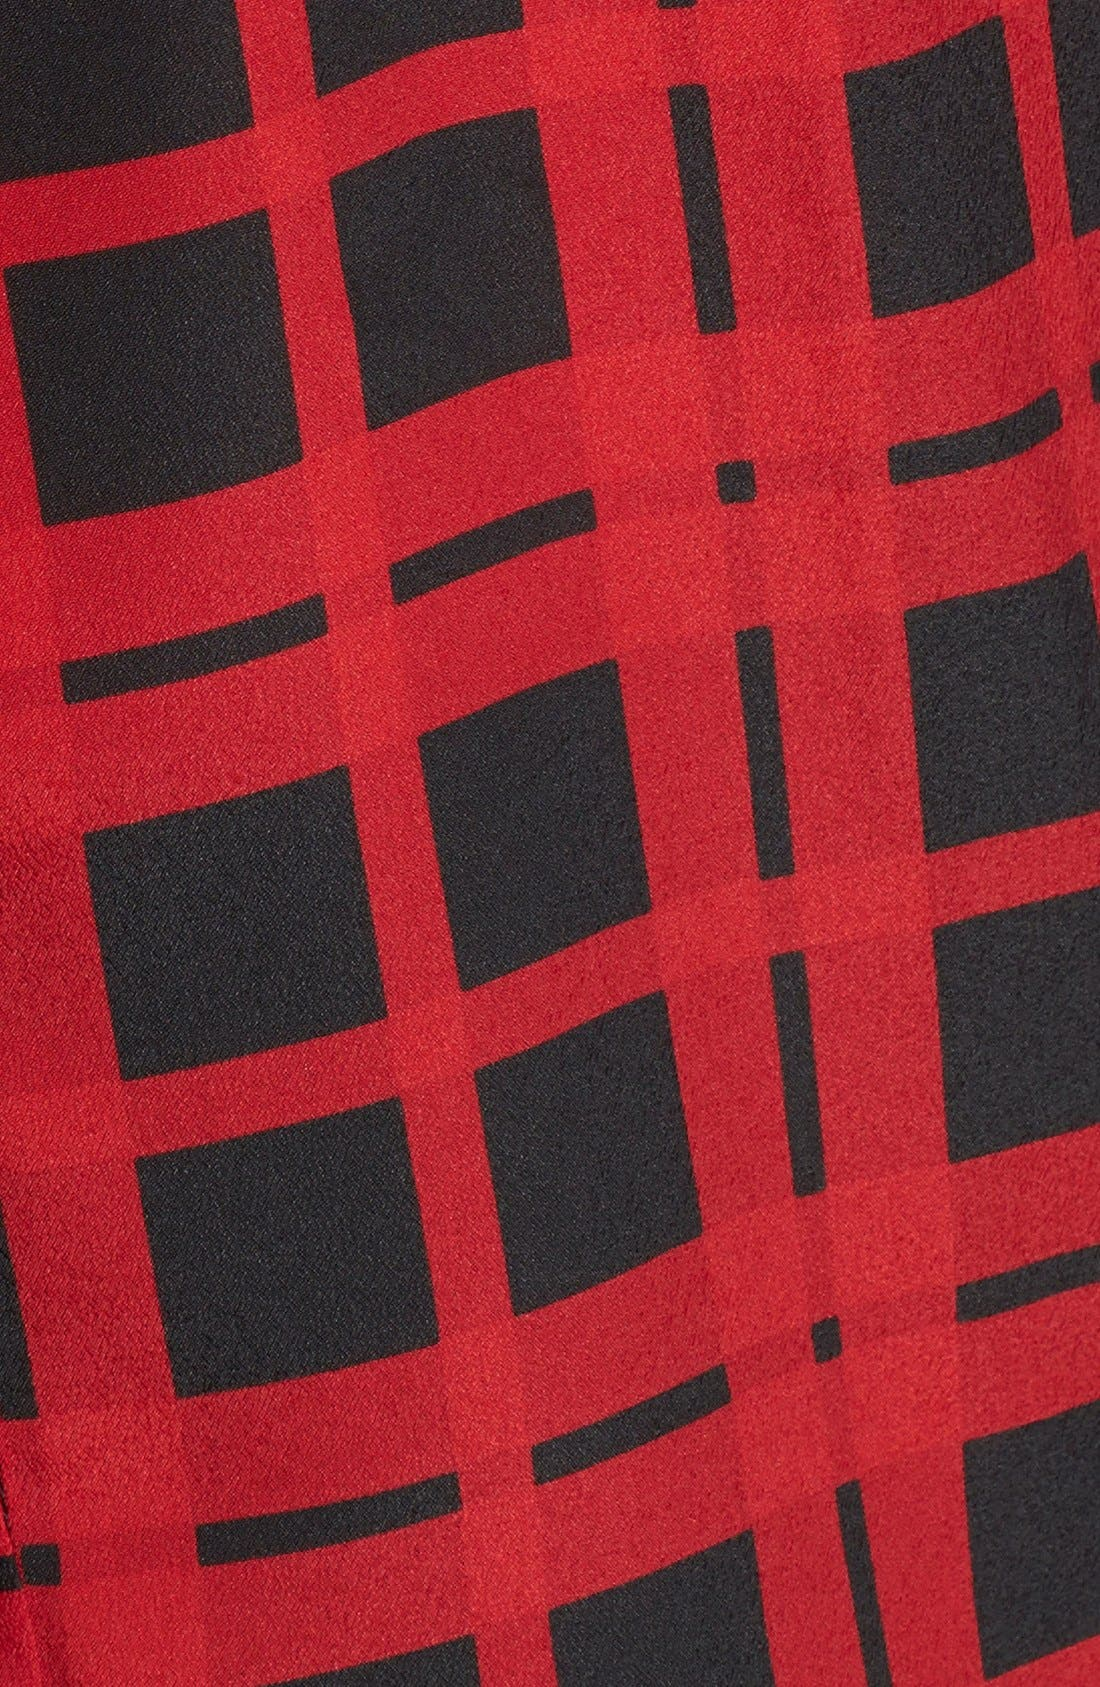 Alternate Image 3  - MICHAEL Michael Kors 'Townsend' Embellished Plaid Blouse (Regular & Petite)